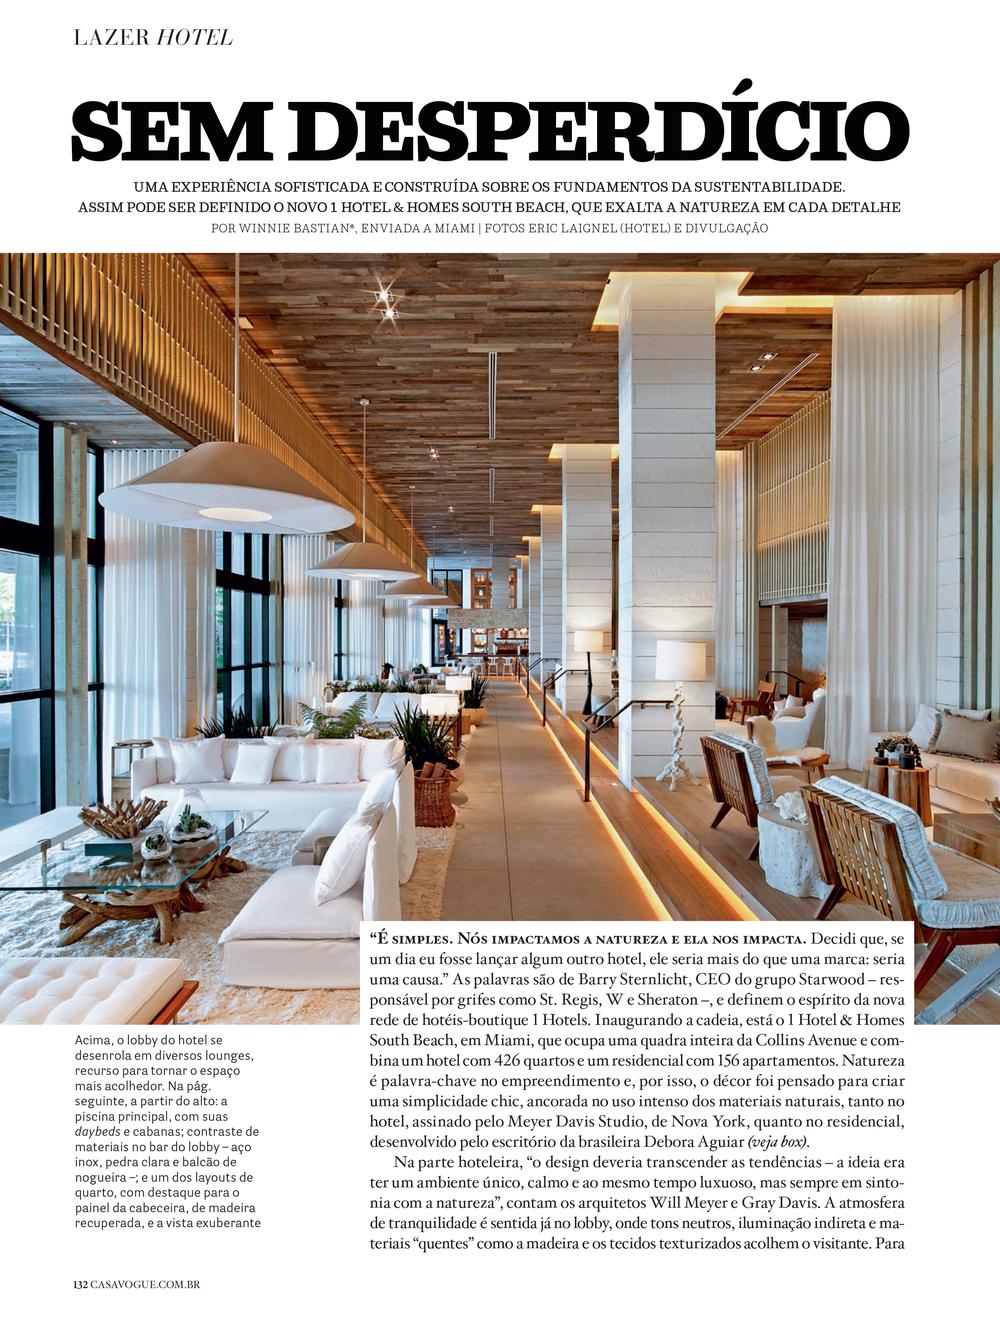 Casa Vogue Brasil_August 2015_1 Hotel South Beach 2.jpg